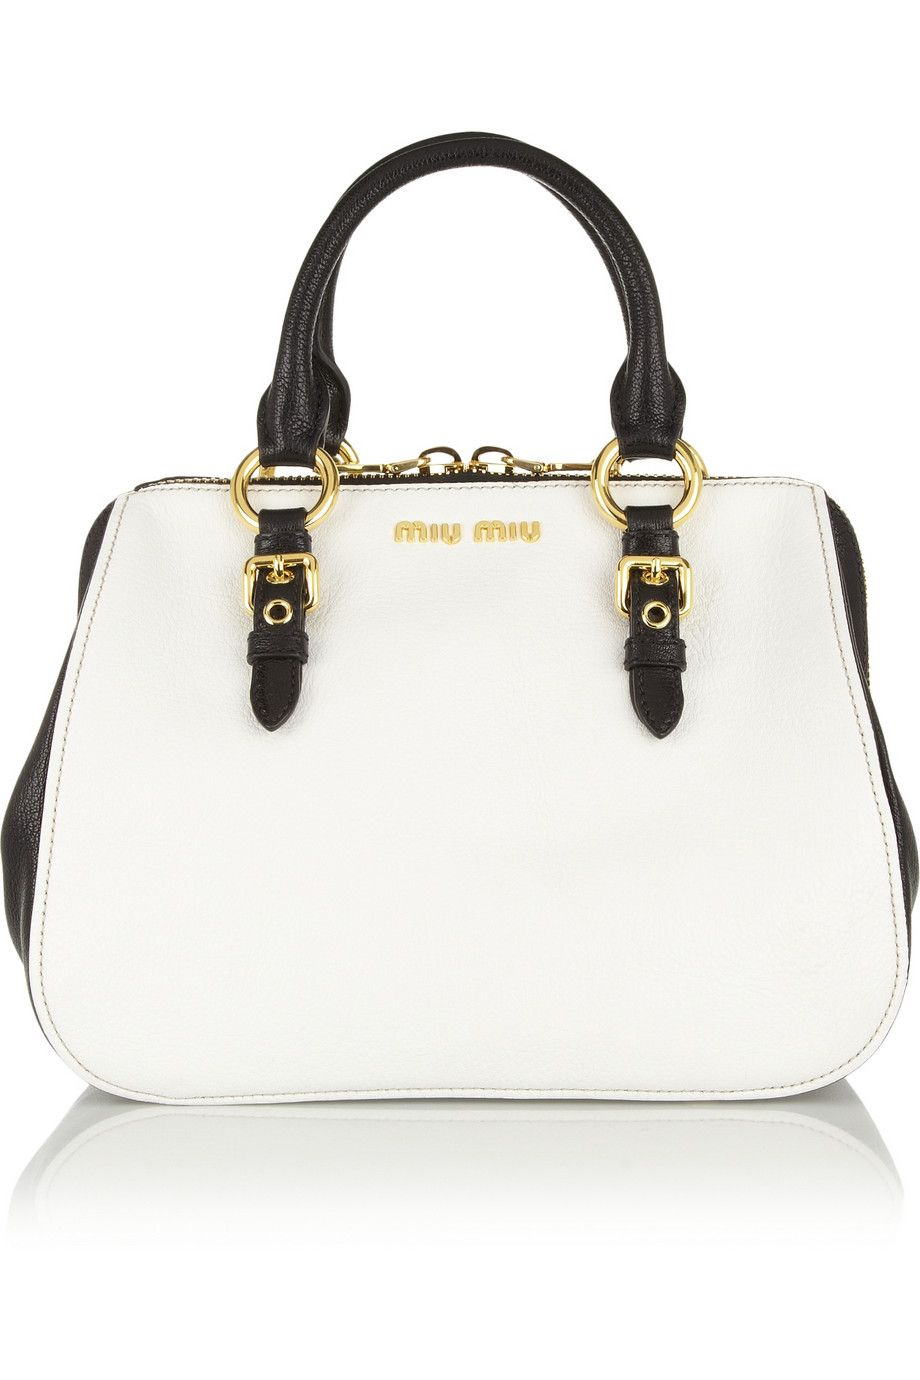 1699934c2d523 Miu Miu Madras leather tote Bolso Blanco, Moda Blanca, Bolsos Cartera,  Carteras,